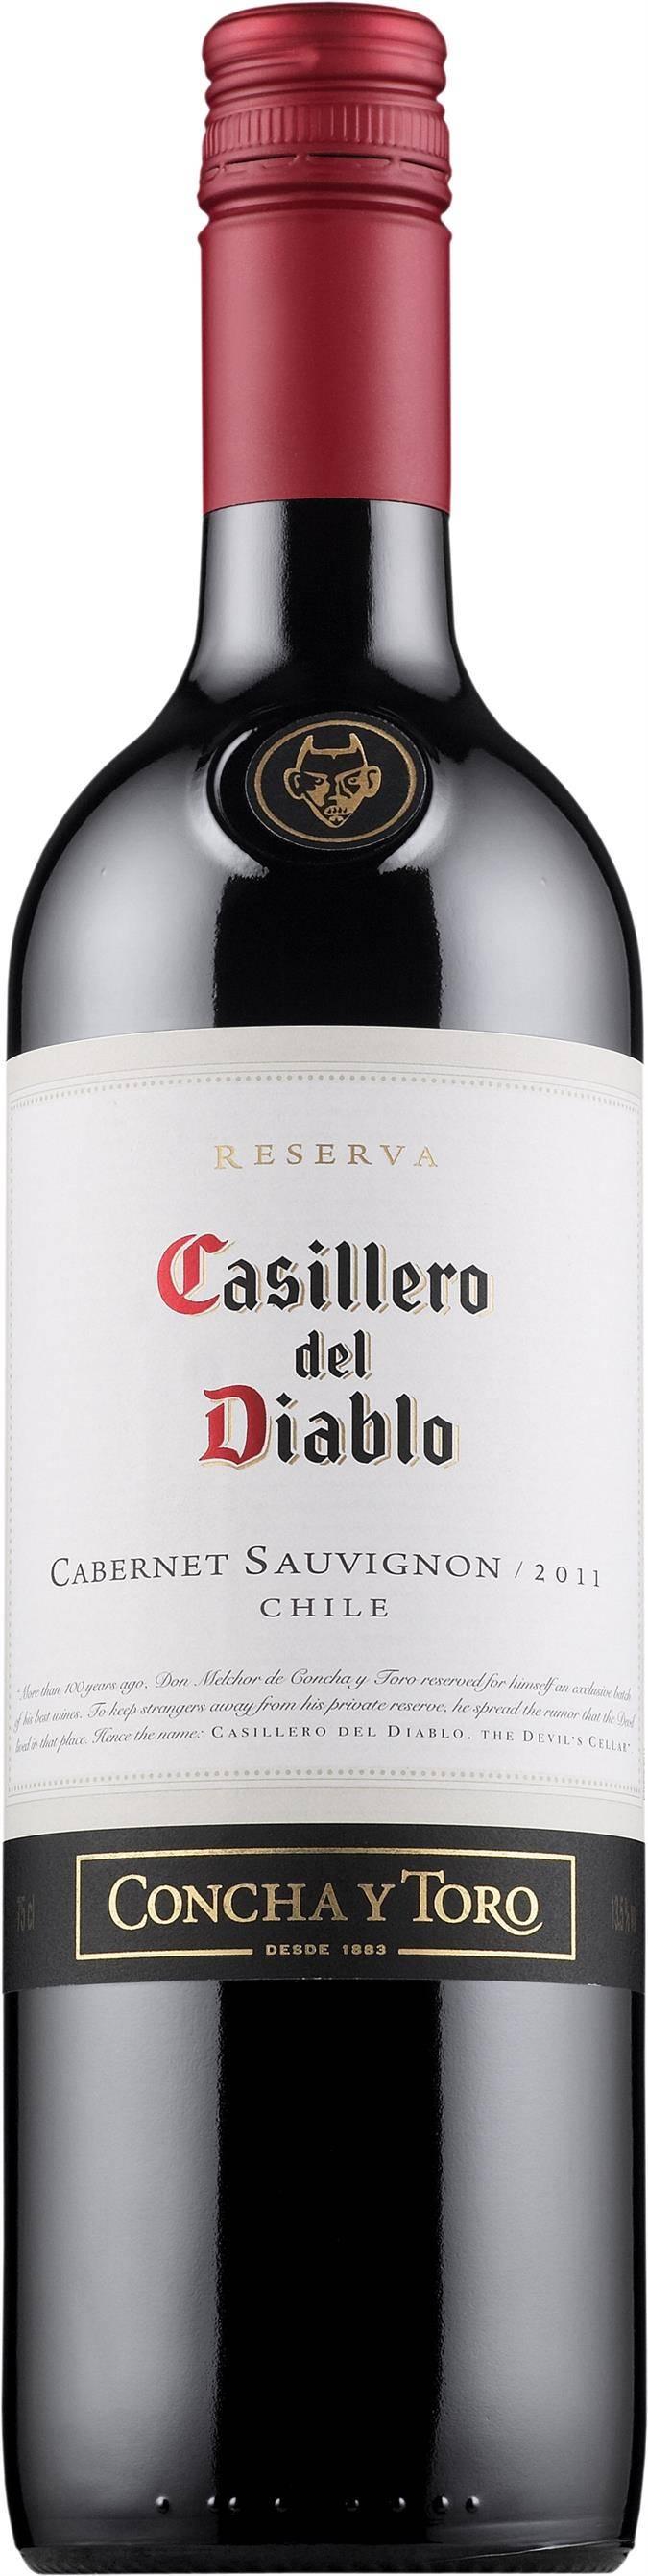 Напиток «сasillero del diablo»